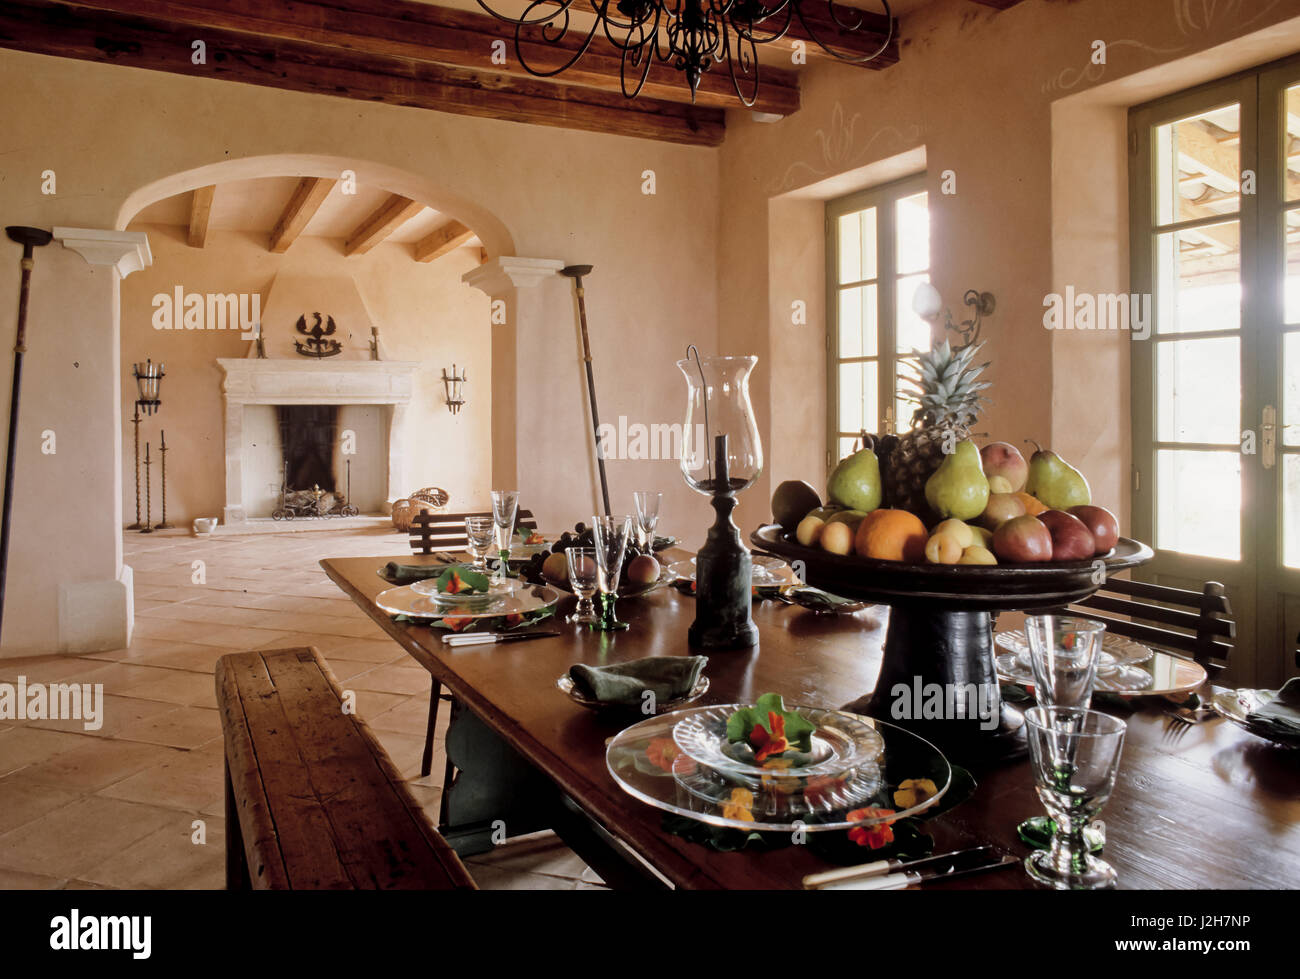 Spanish Style Dining Room Stock Photo Alamy